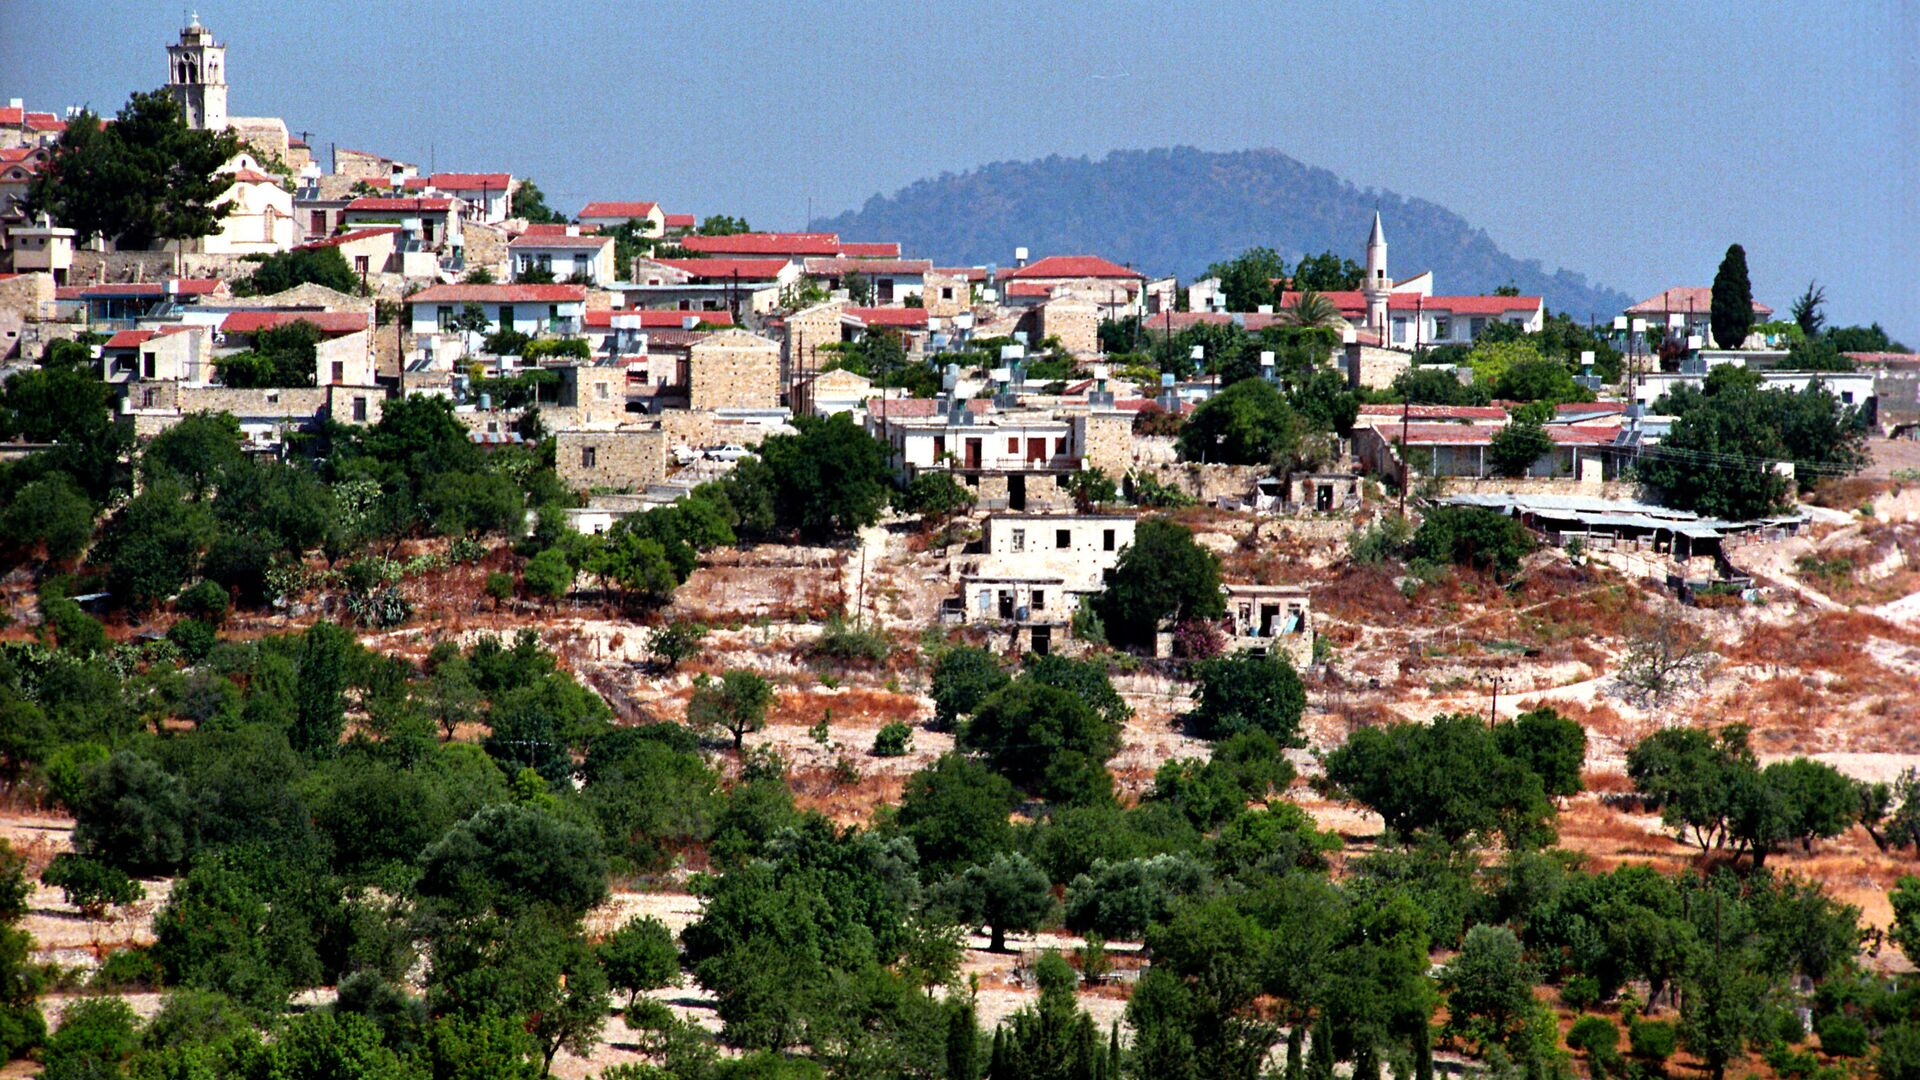 Вид на город Лимассол на Кипре - РИА Новости, 1920, 25.08.2020